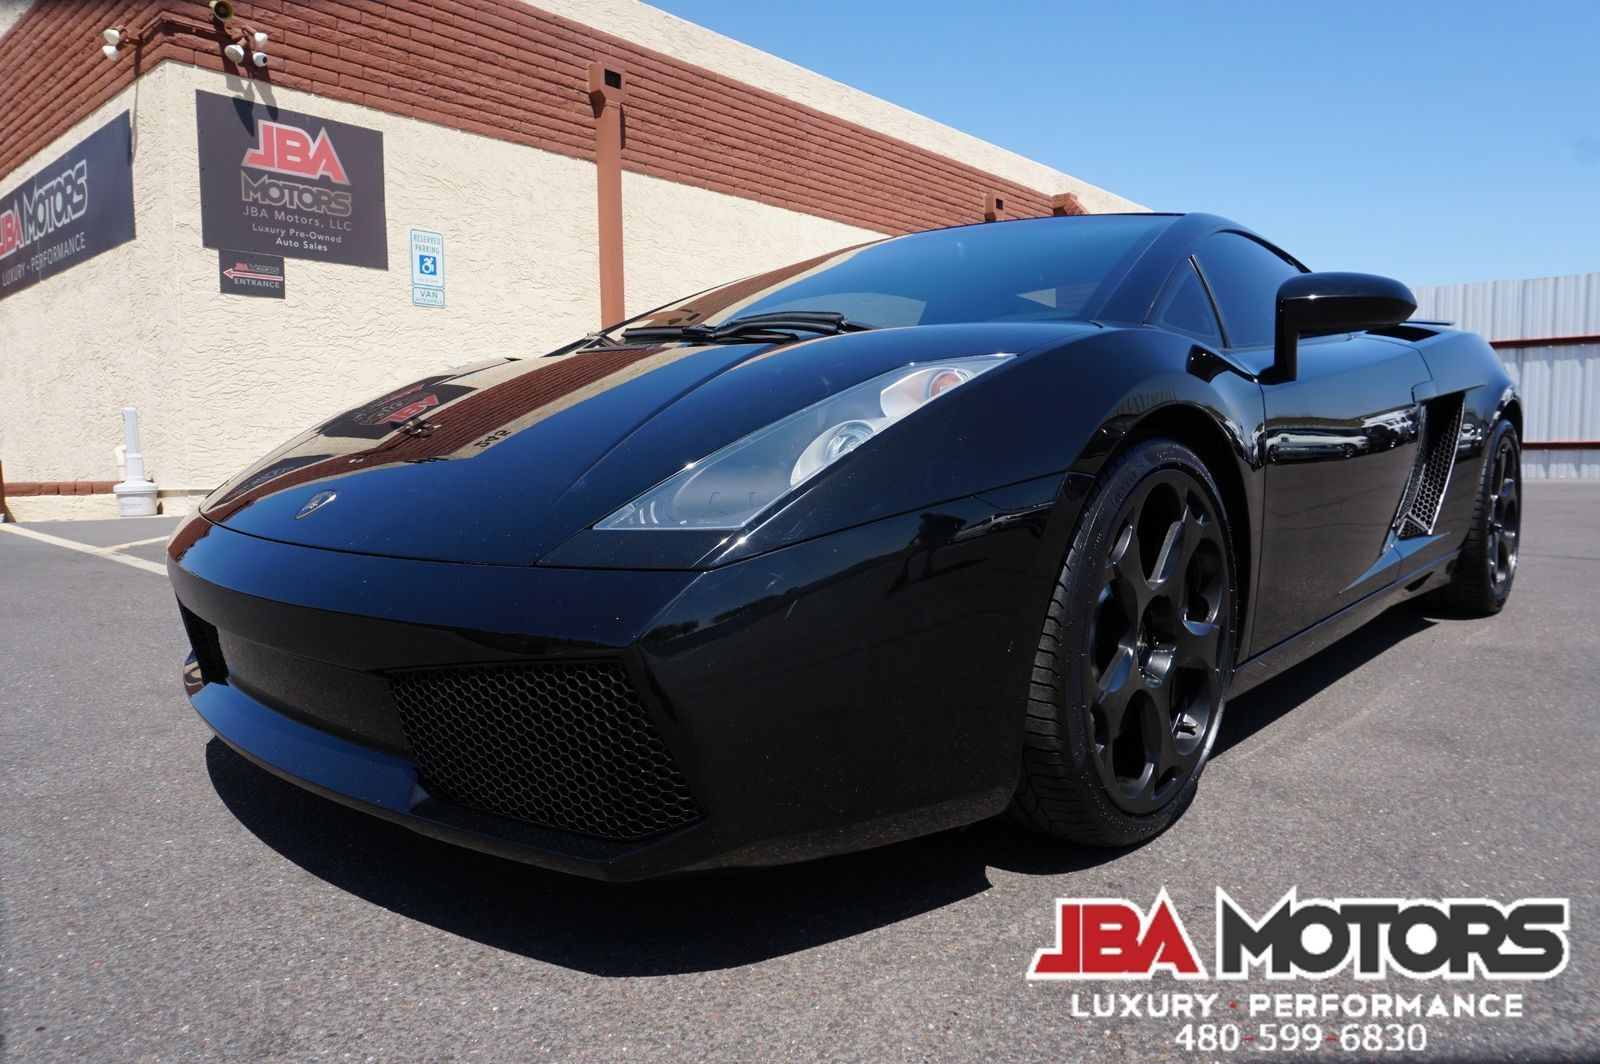 Superb Amazing Lamborghini Gallardo Coupe 2005 Black Coupe! 2018 2019